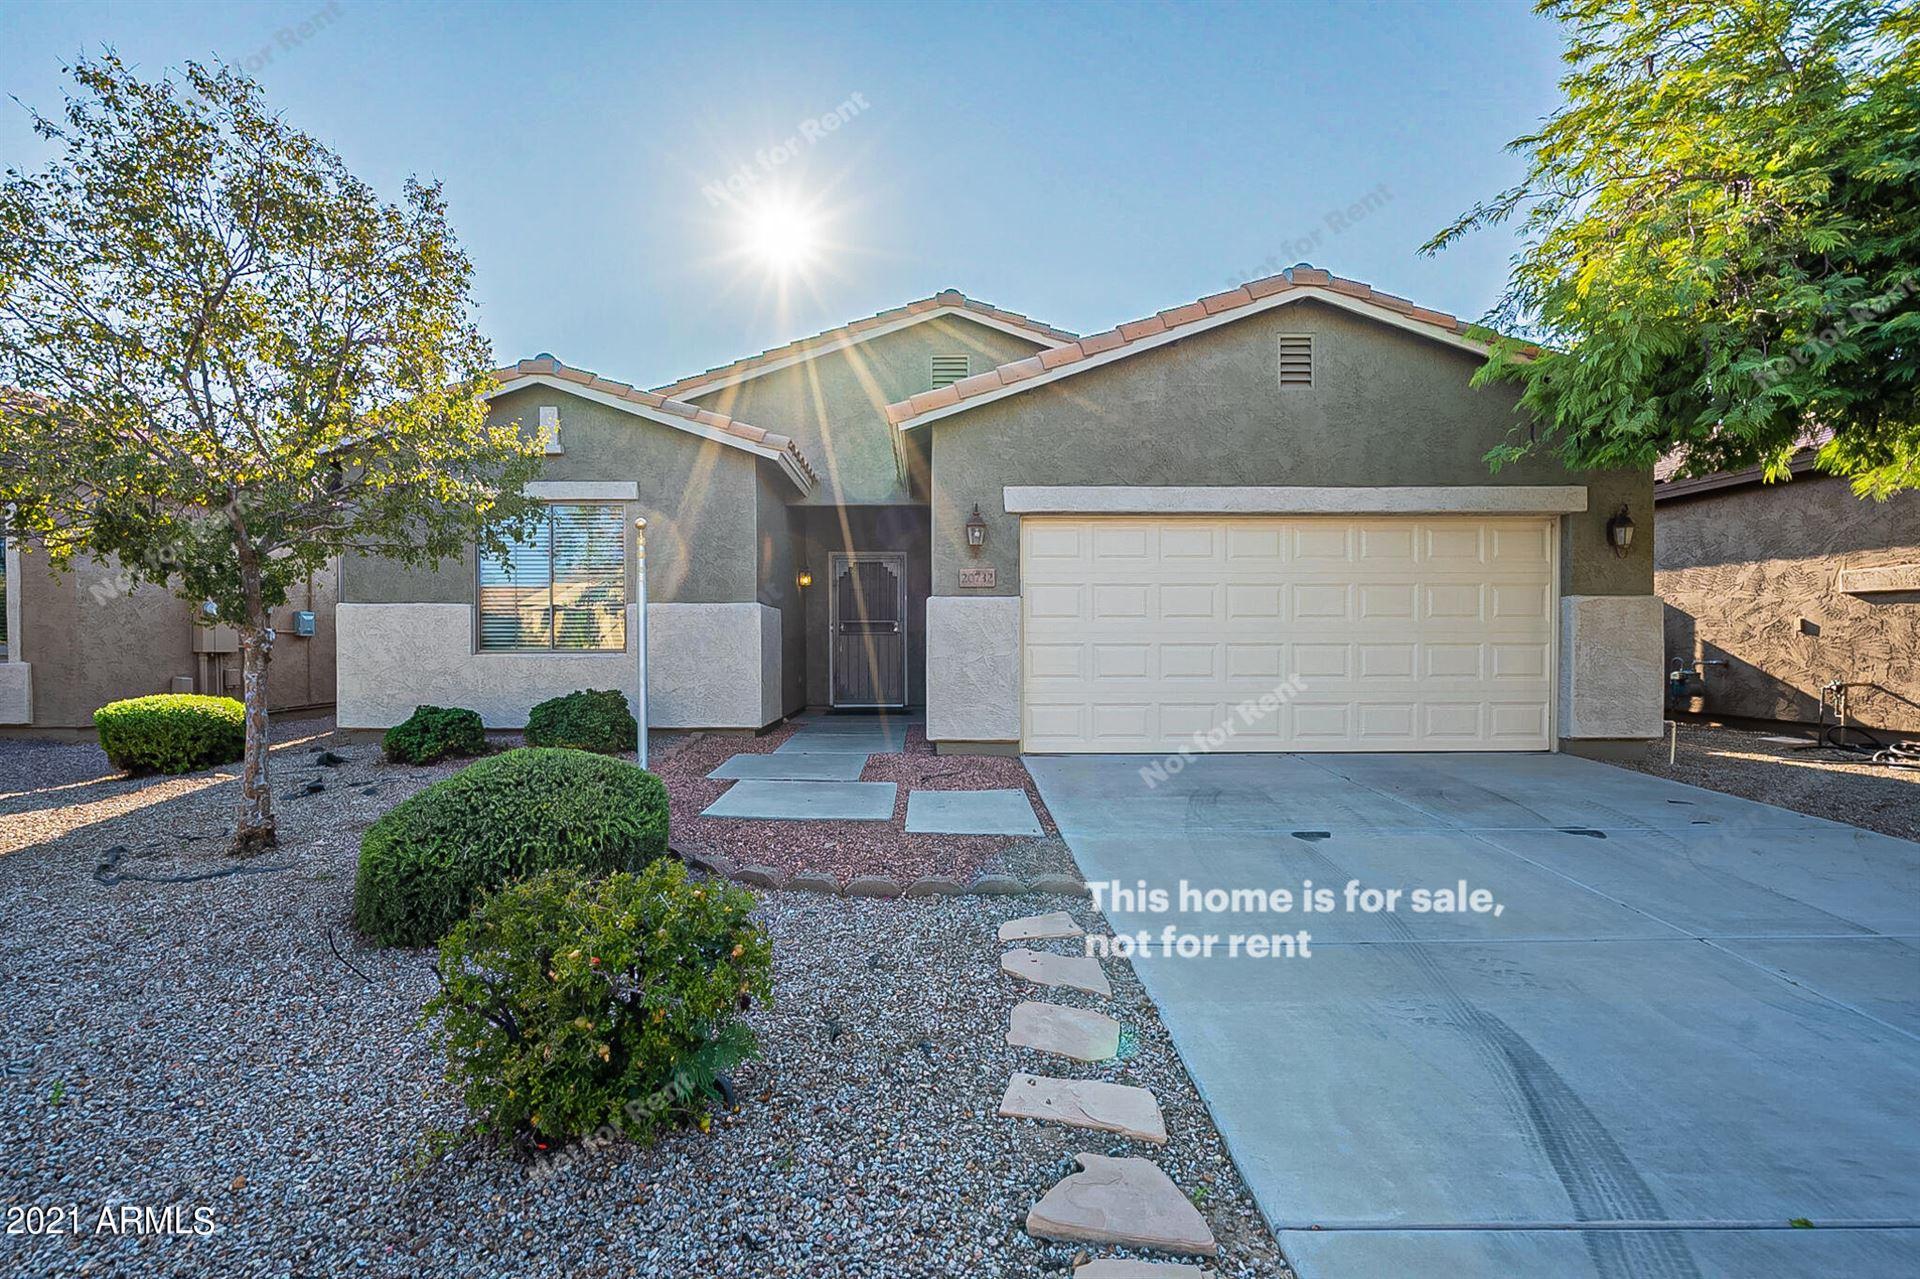 Photo for 20732 N CARMEN Avenue, Maricopa, AZ 85139 (MLS # 6291540)